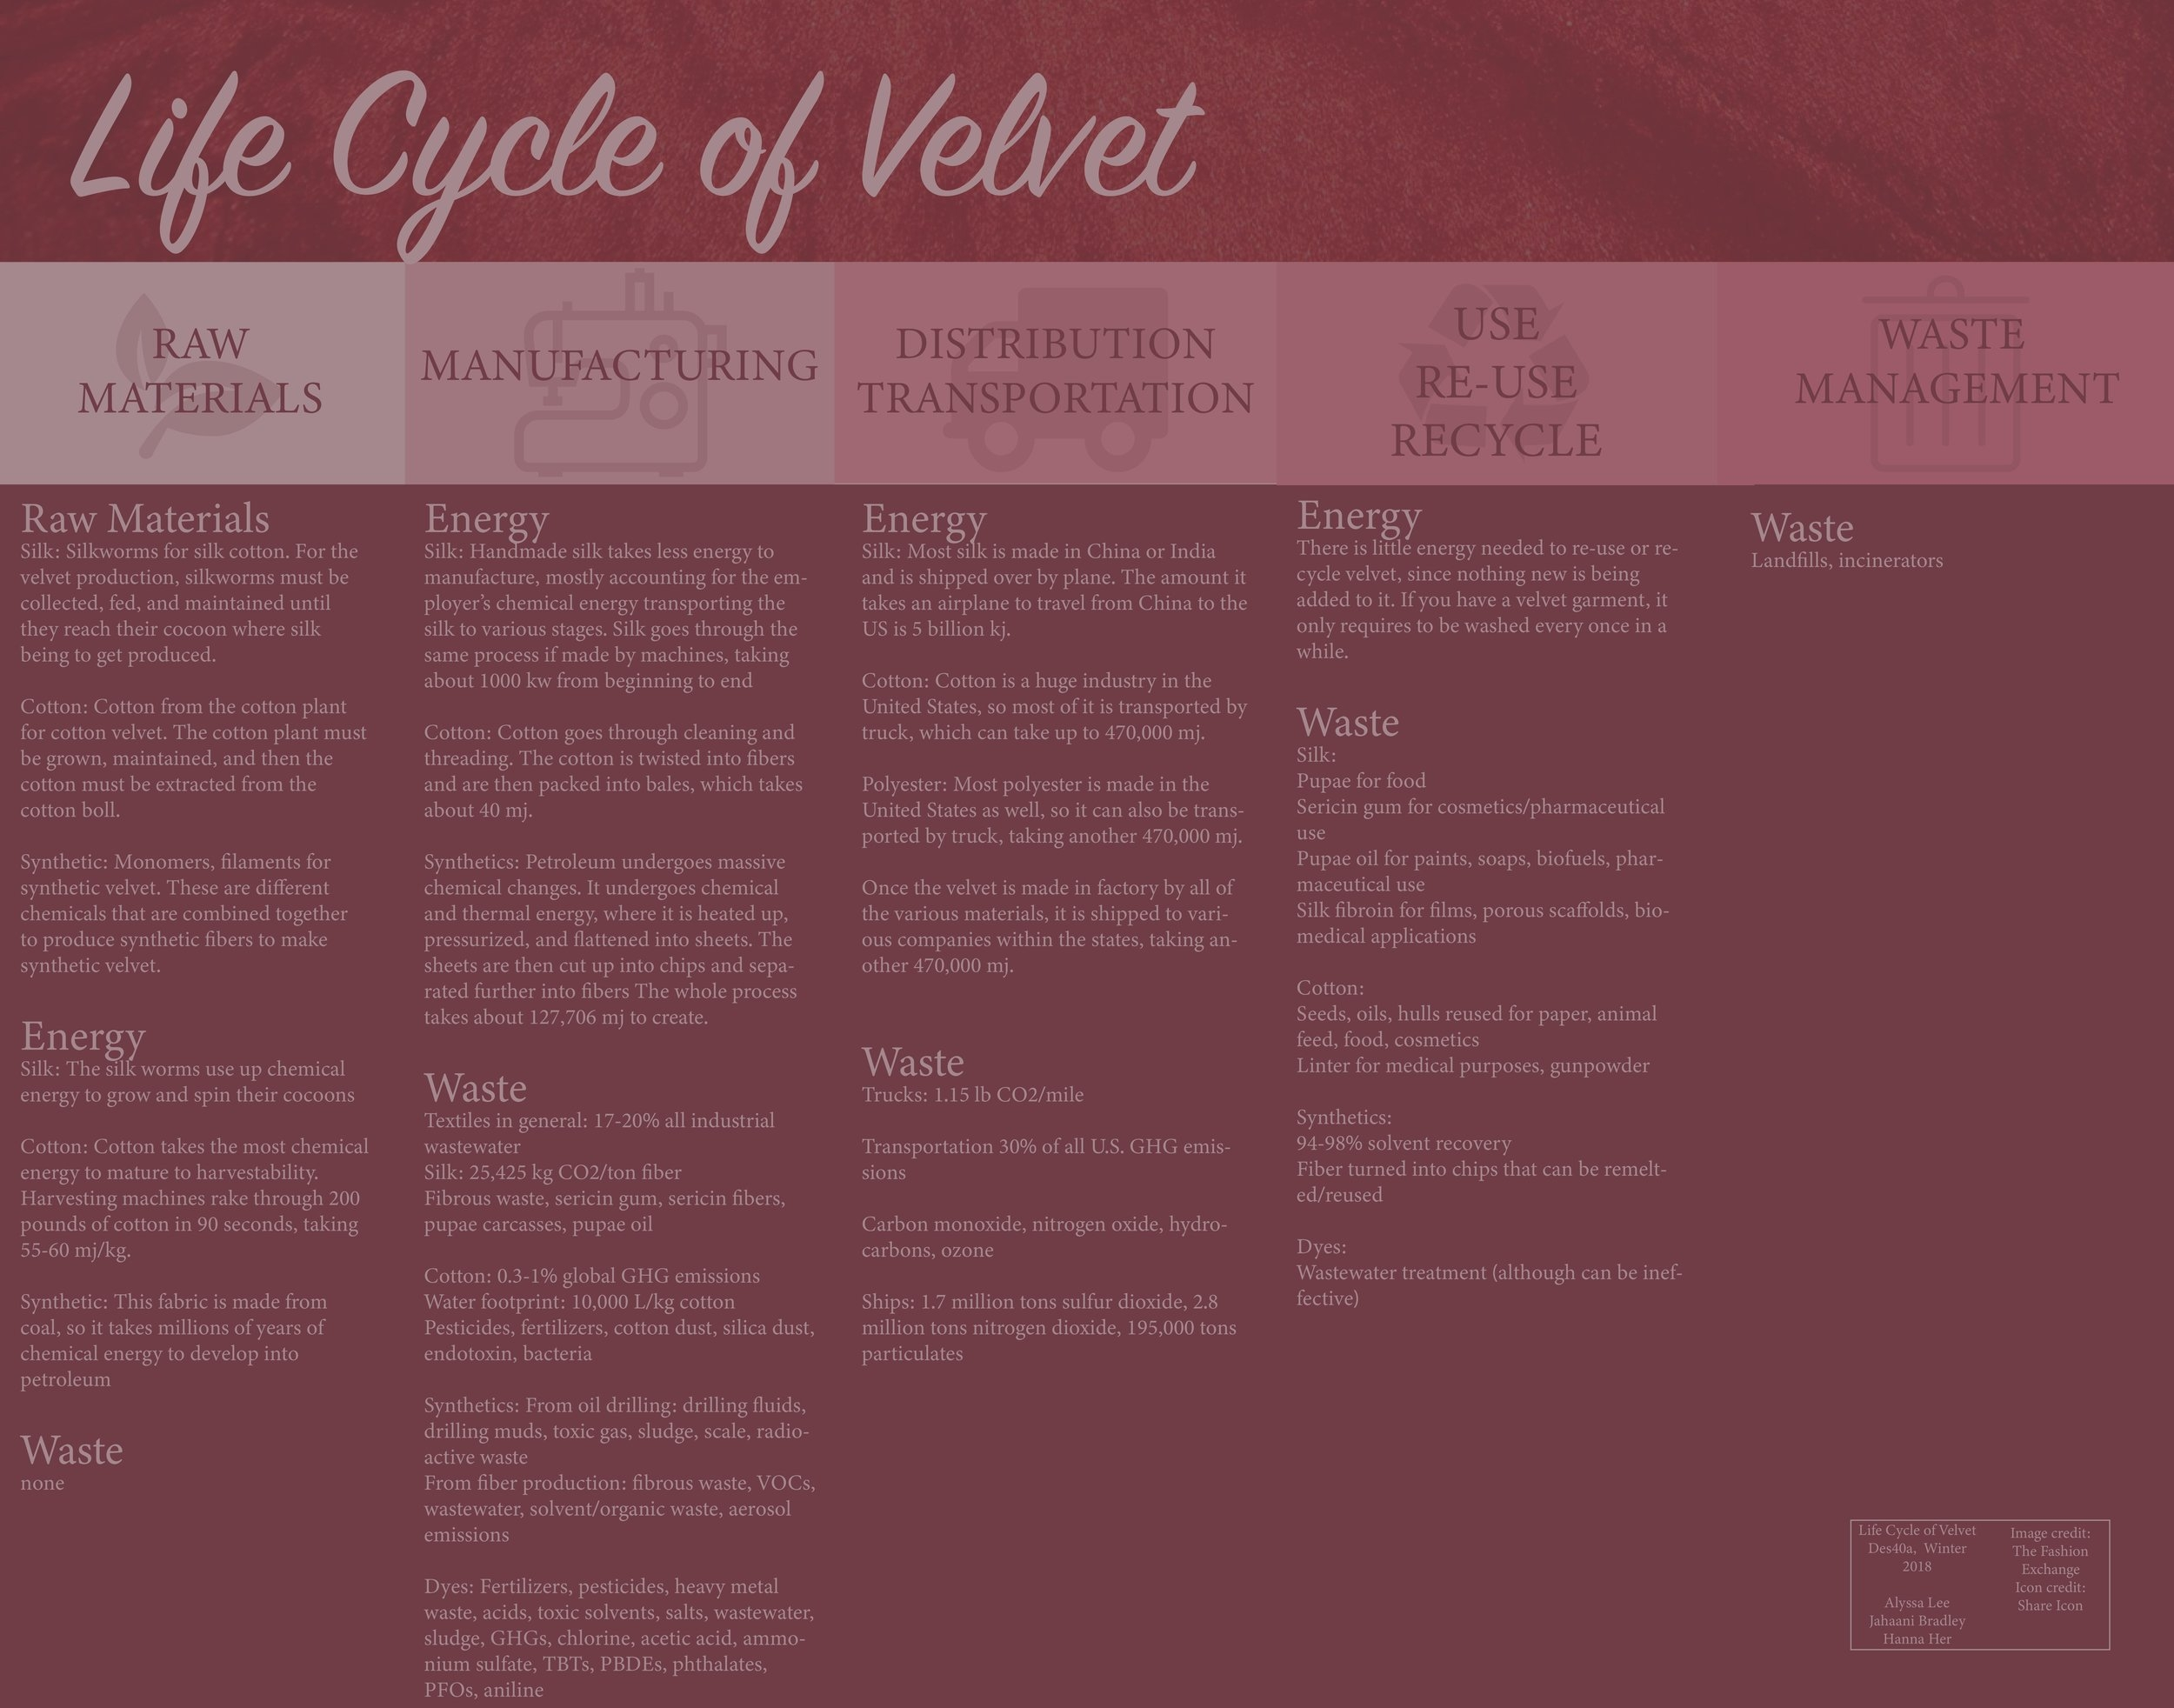 velvetlifecycle copy-page-001.jpg